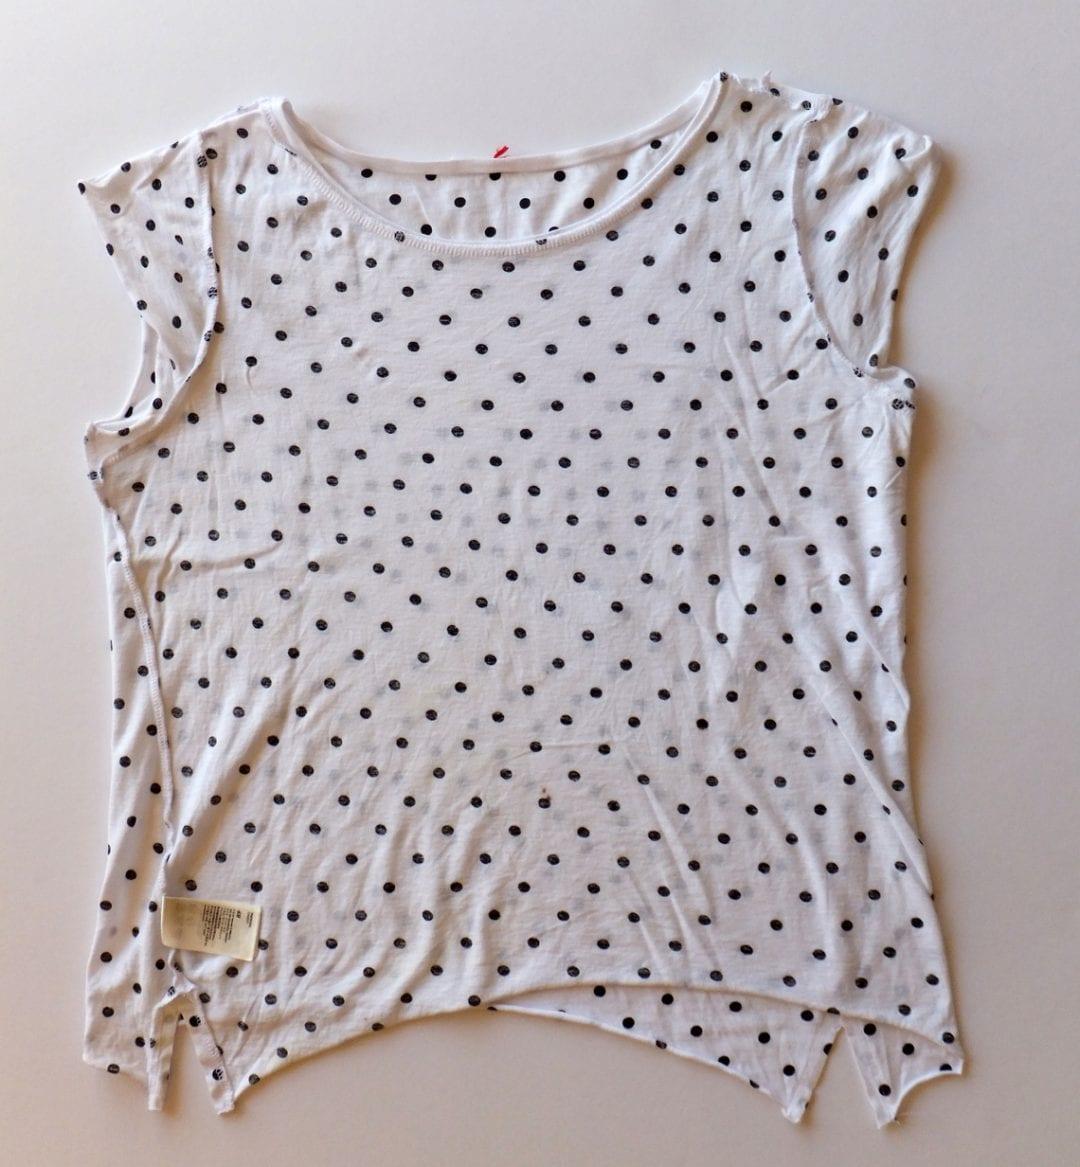 camiseta costuras torcidas y giradas